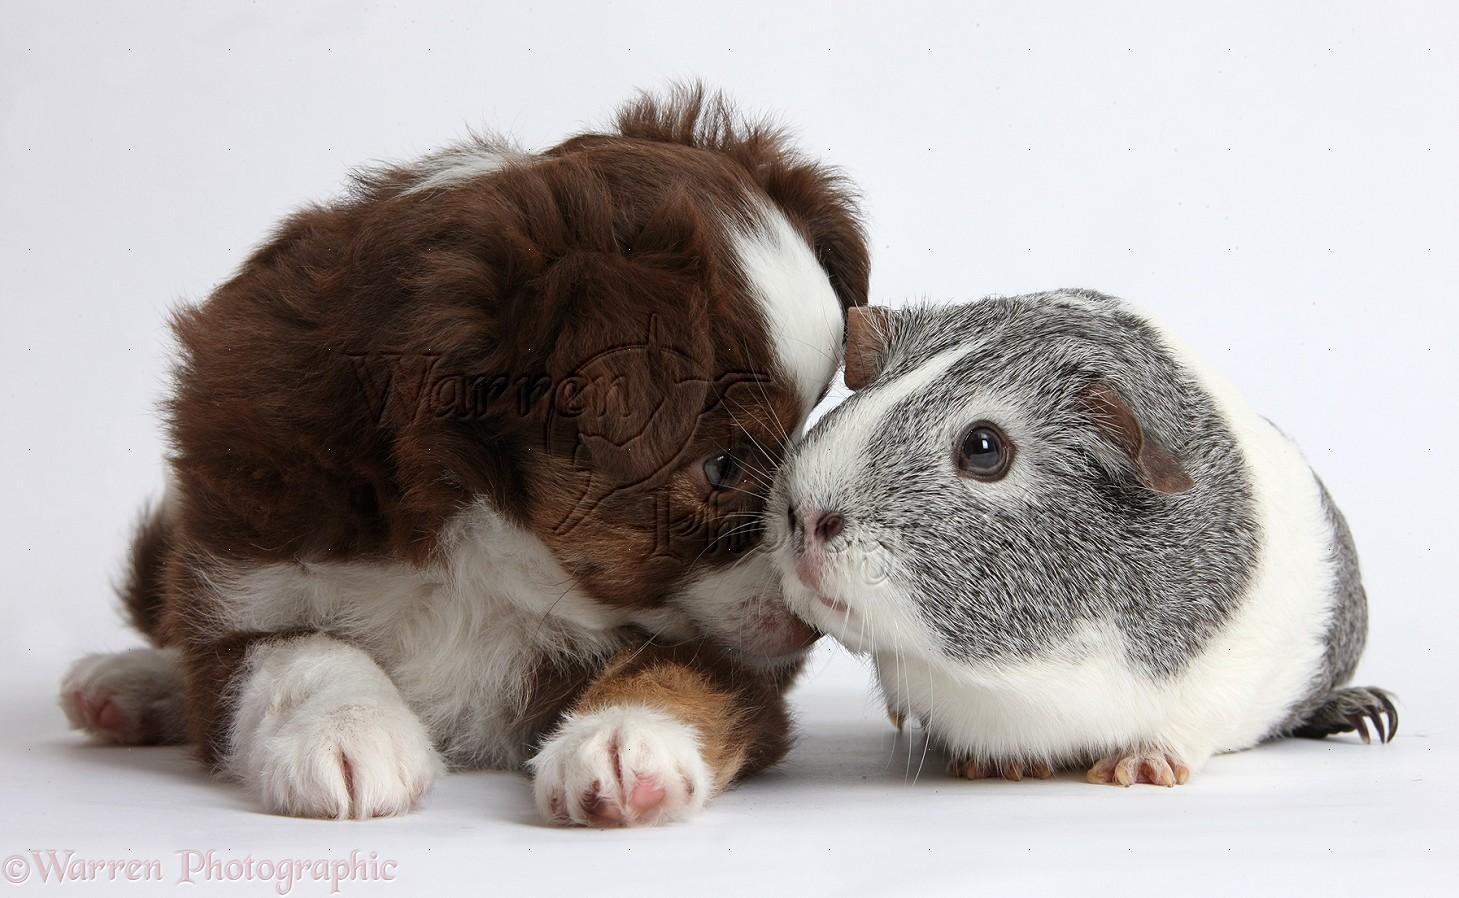 Pets: Mini American Shepherd puppy and Guinea pig photo